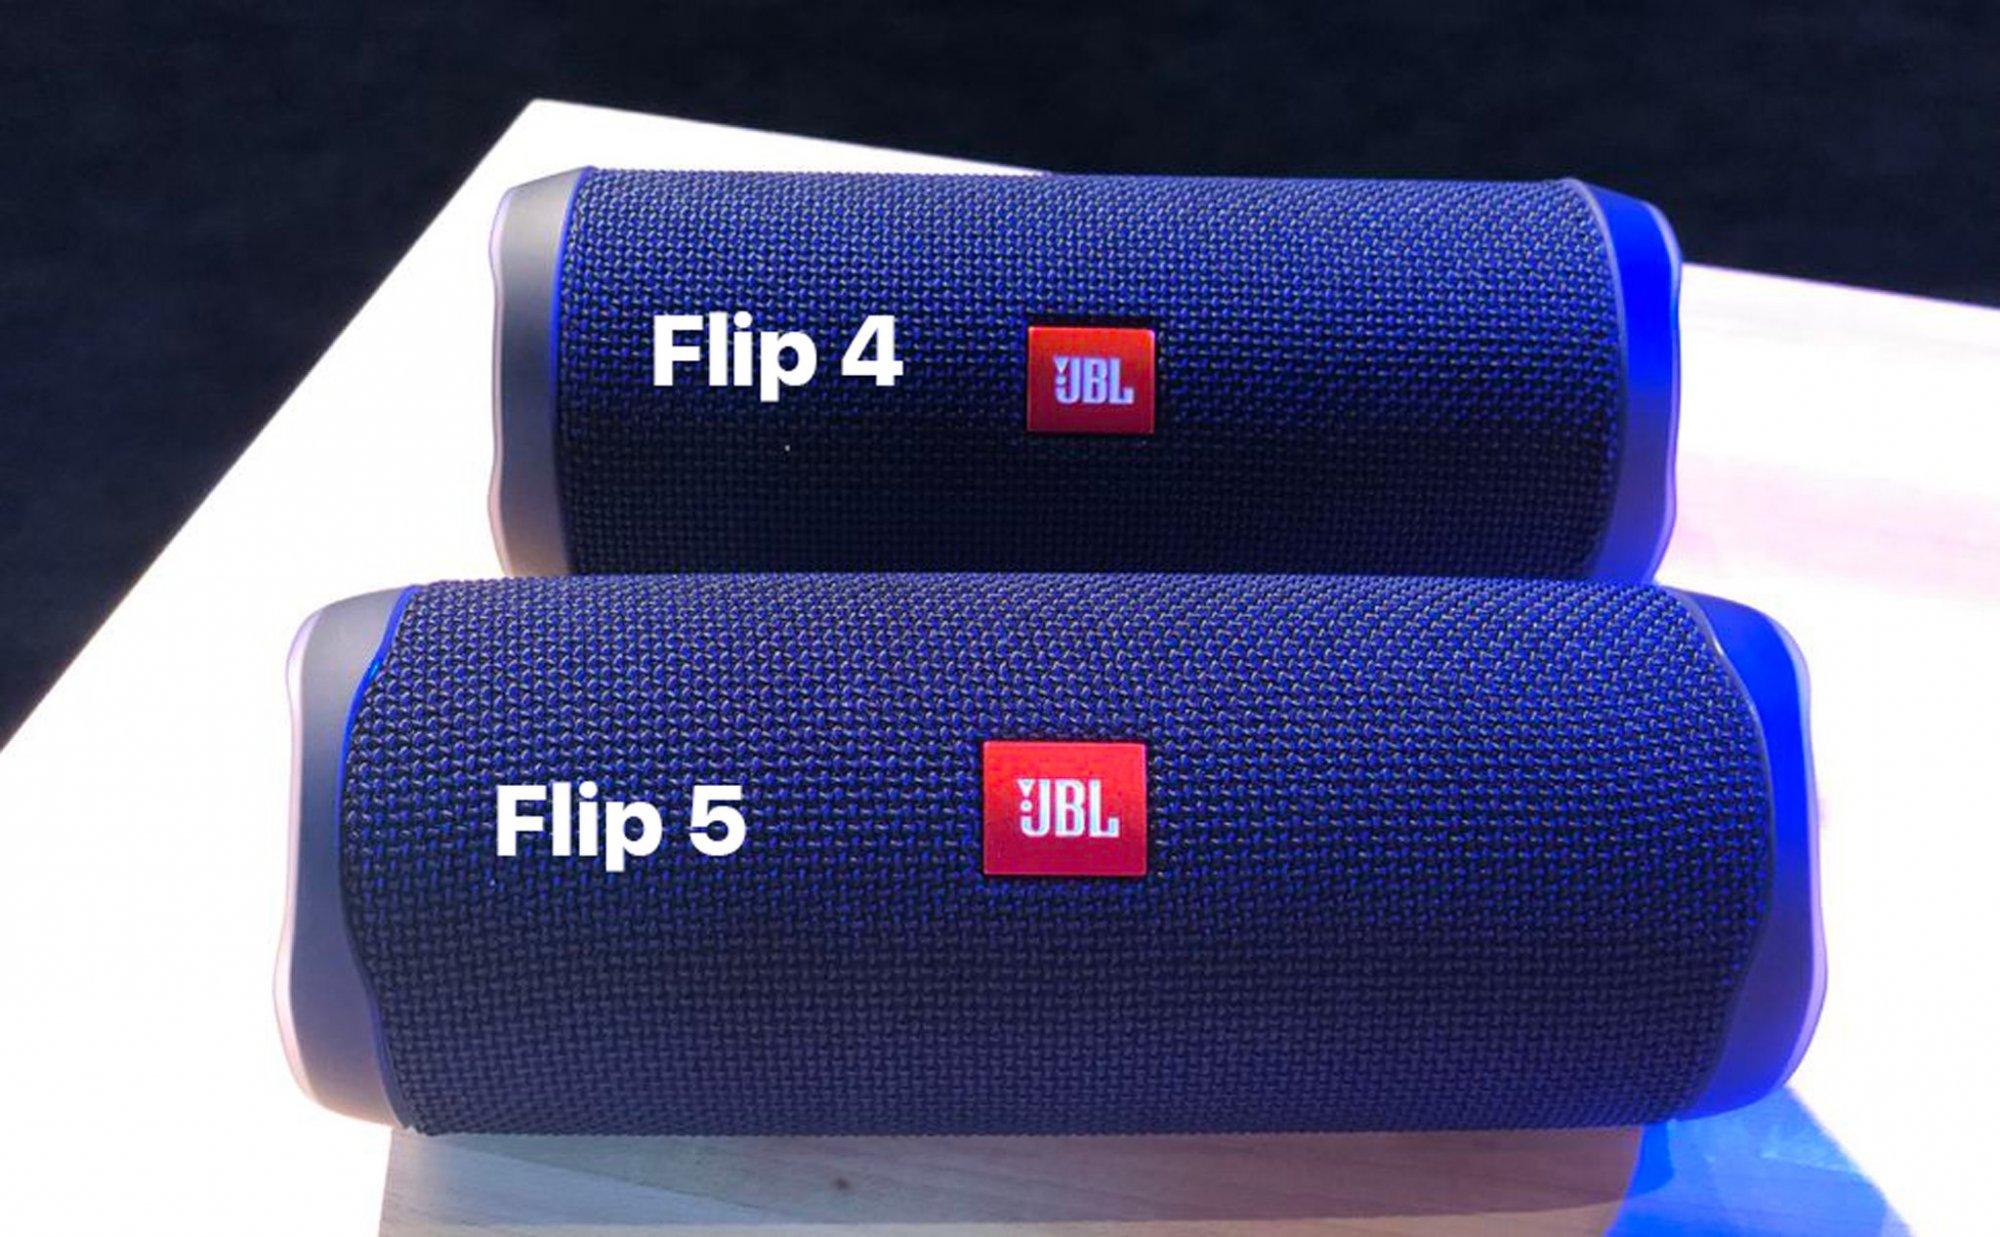 loa-jbl-flip-5-Lx5932